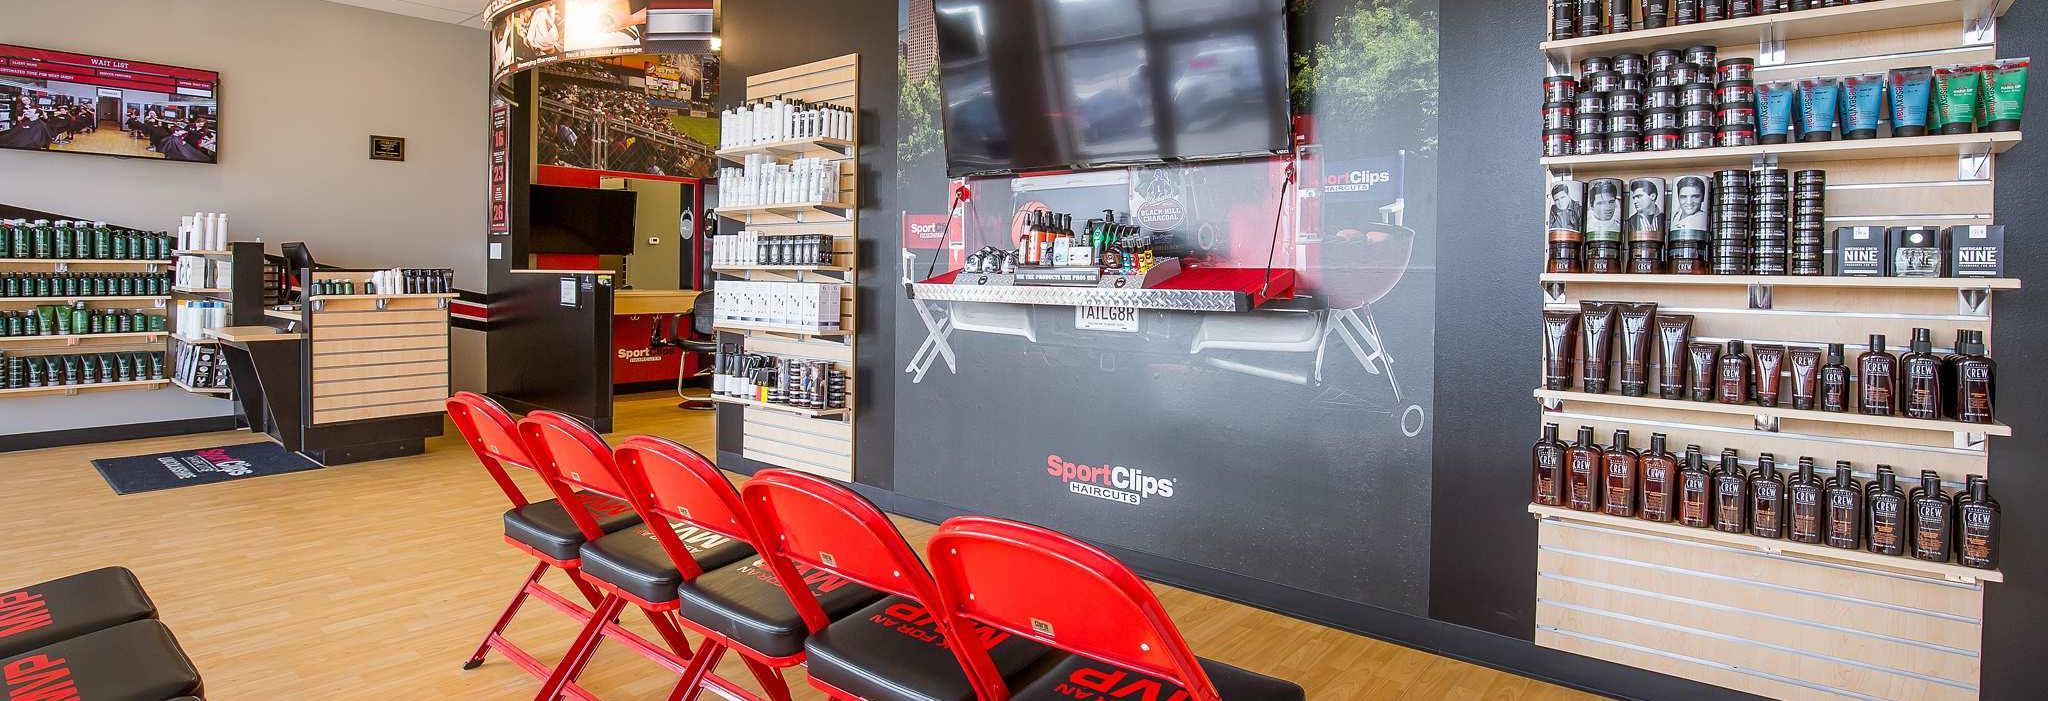 sport clips haircuts westgate toledo ohio